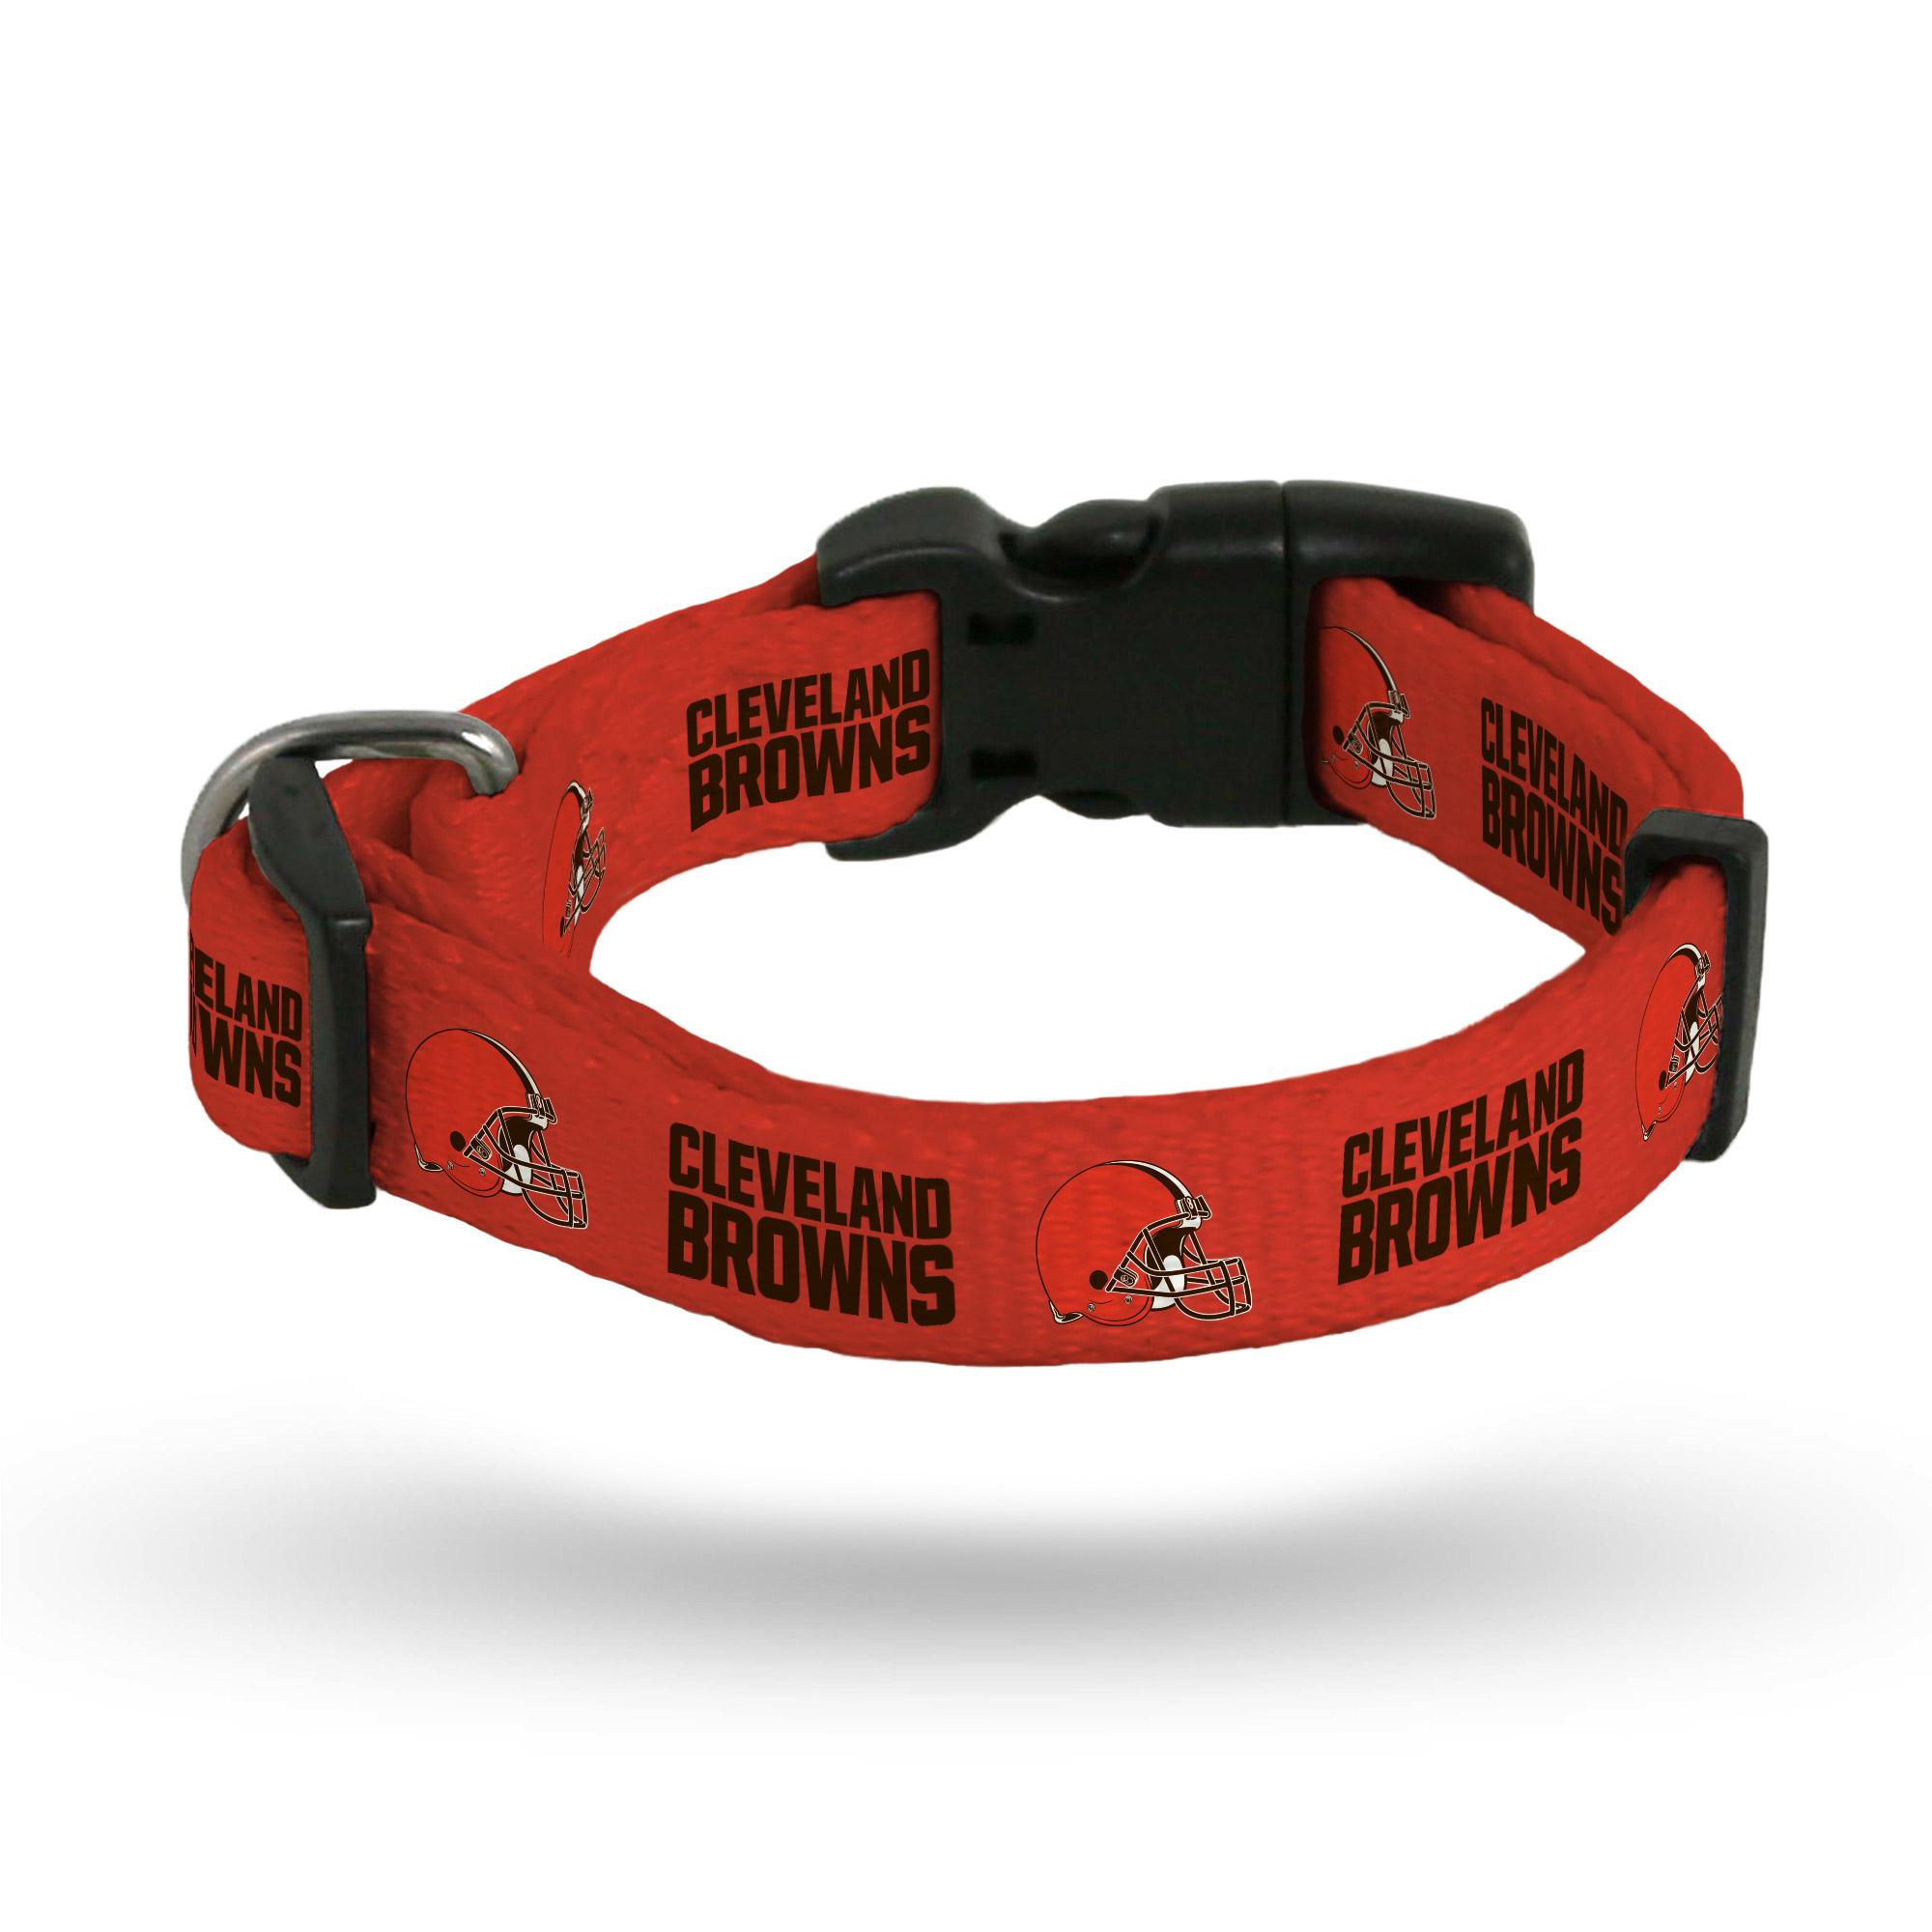 Cleveland Browns Sparo Rugged Pet Collar